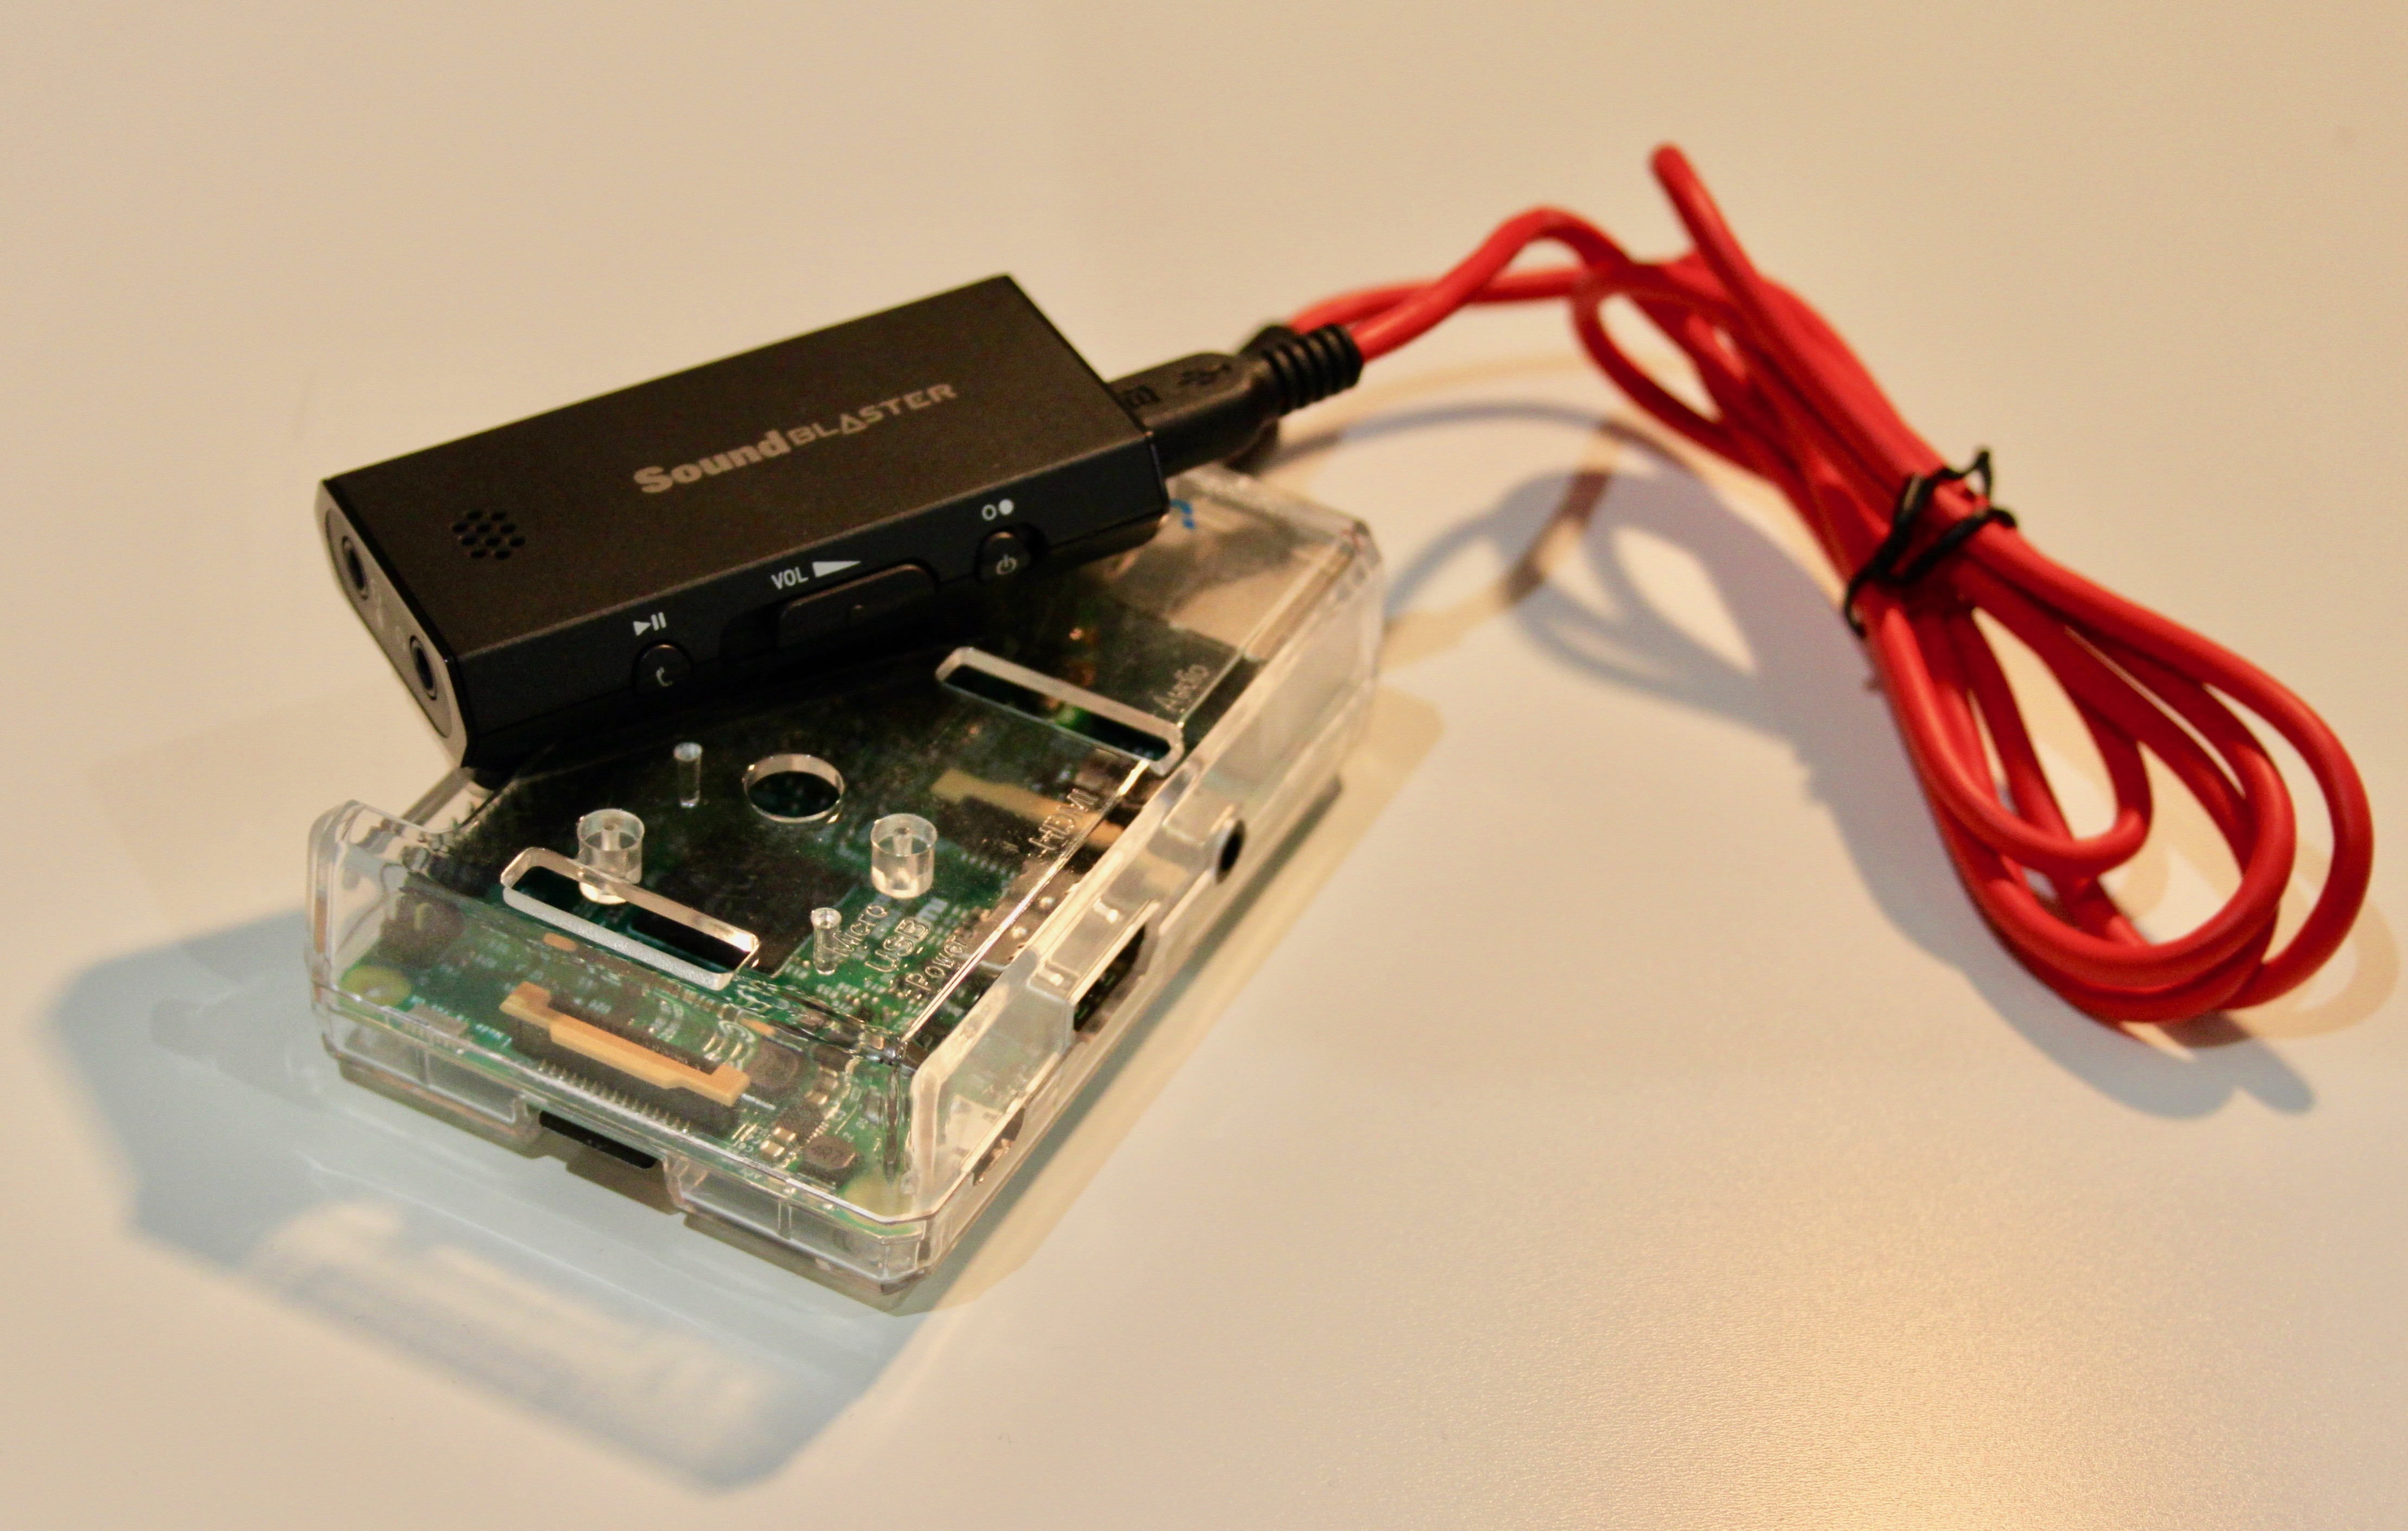 Quickly setup a USB sound card on a Raspberry Pi 3